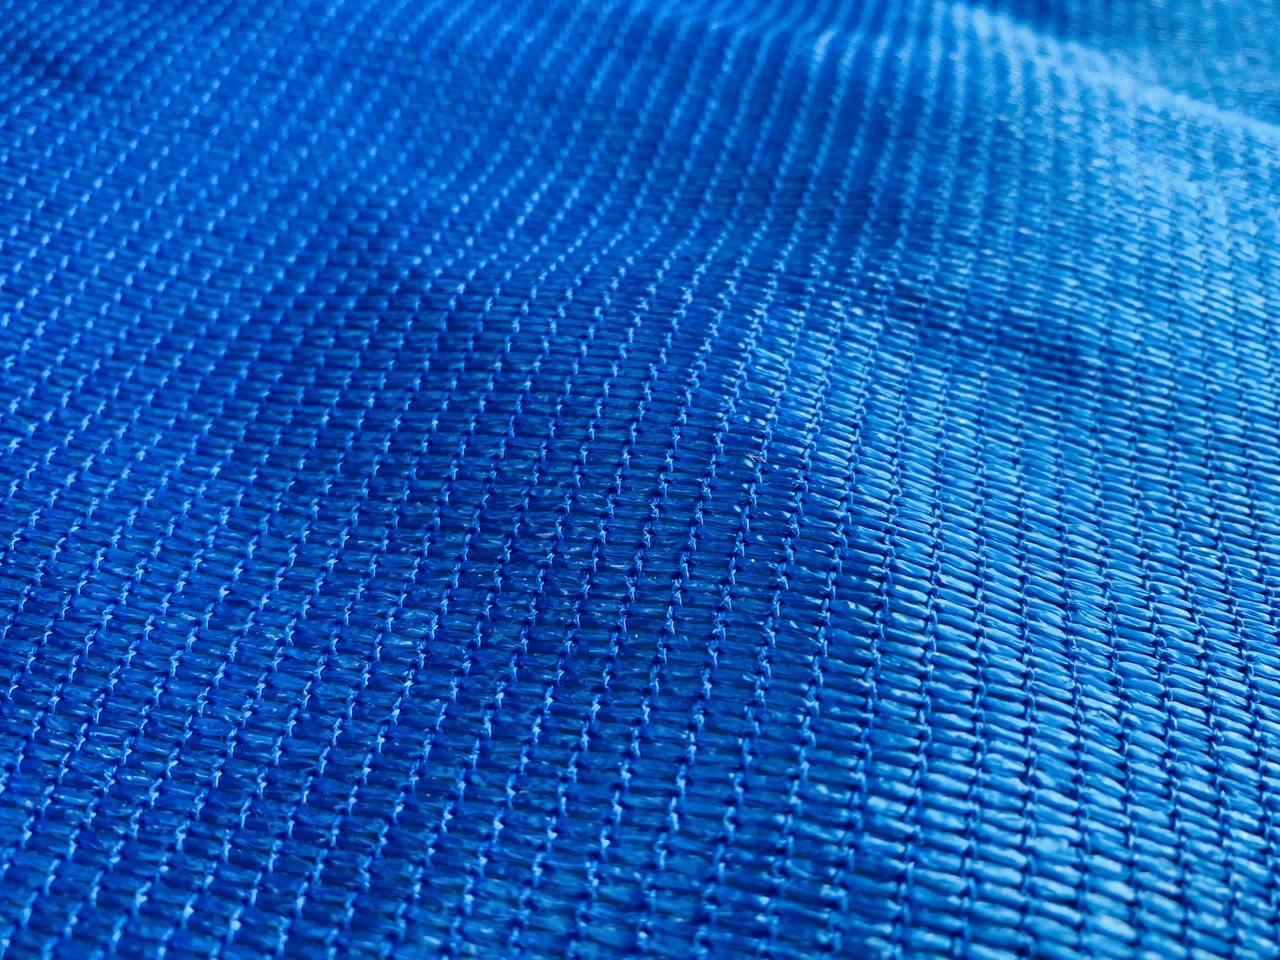 Tela de Sombreamento 90% Azul com Esticadores - Largura: 2,5 Metros